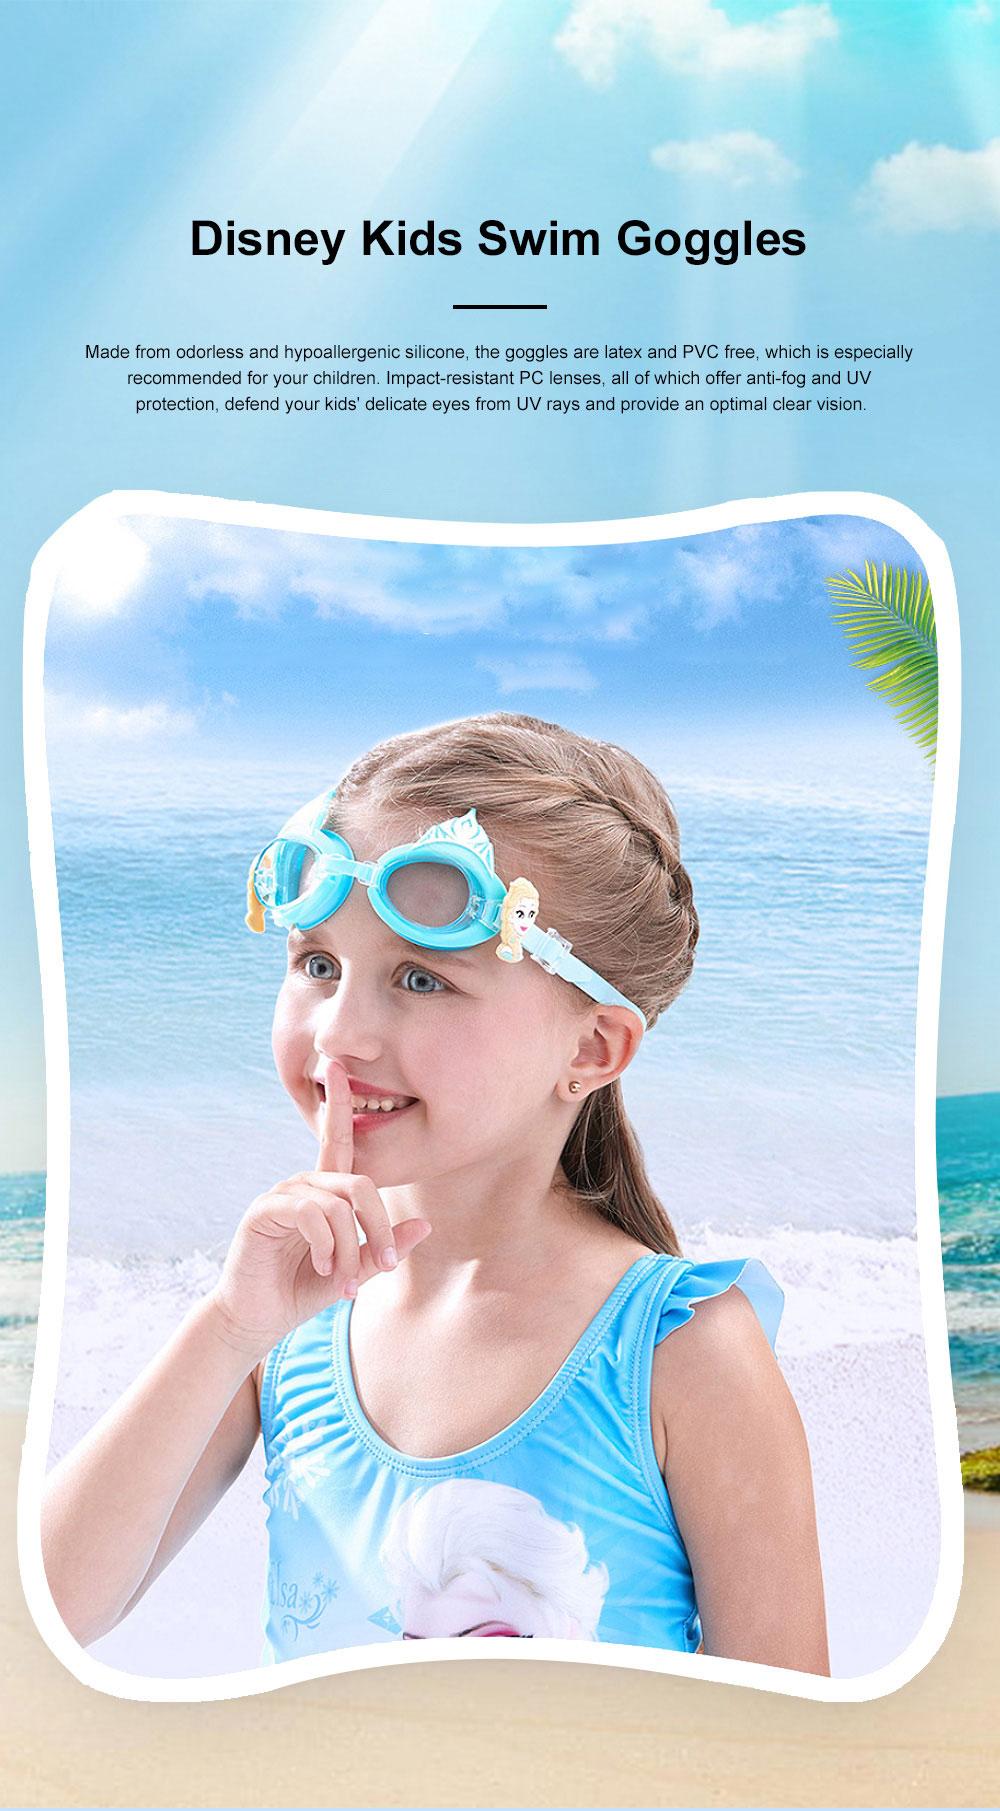 Kids Swim Goggles Cute Swimming Glasses Premium PC lenses Anti-Fog Waterproof UV Protection Swimming Goggles for Kids 0